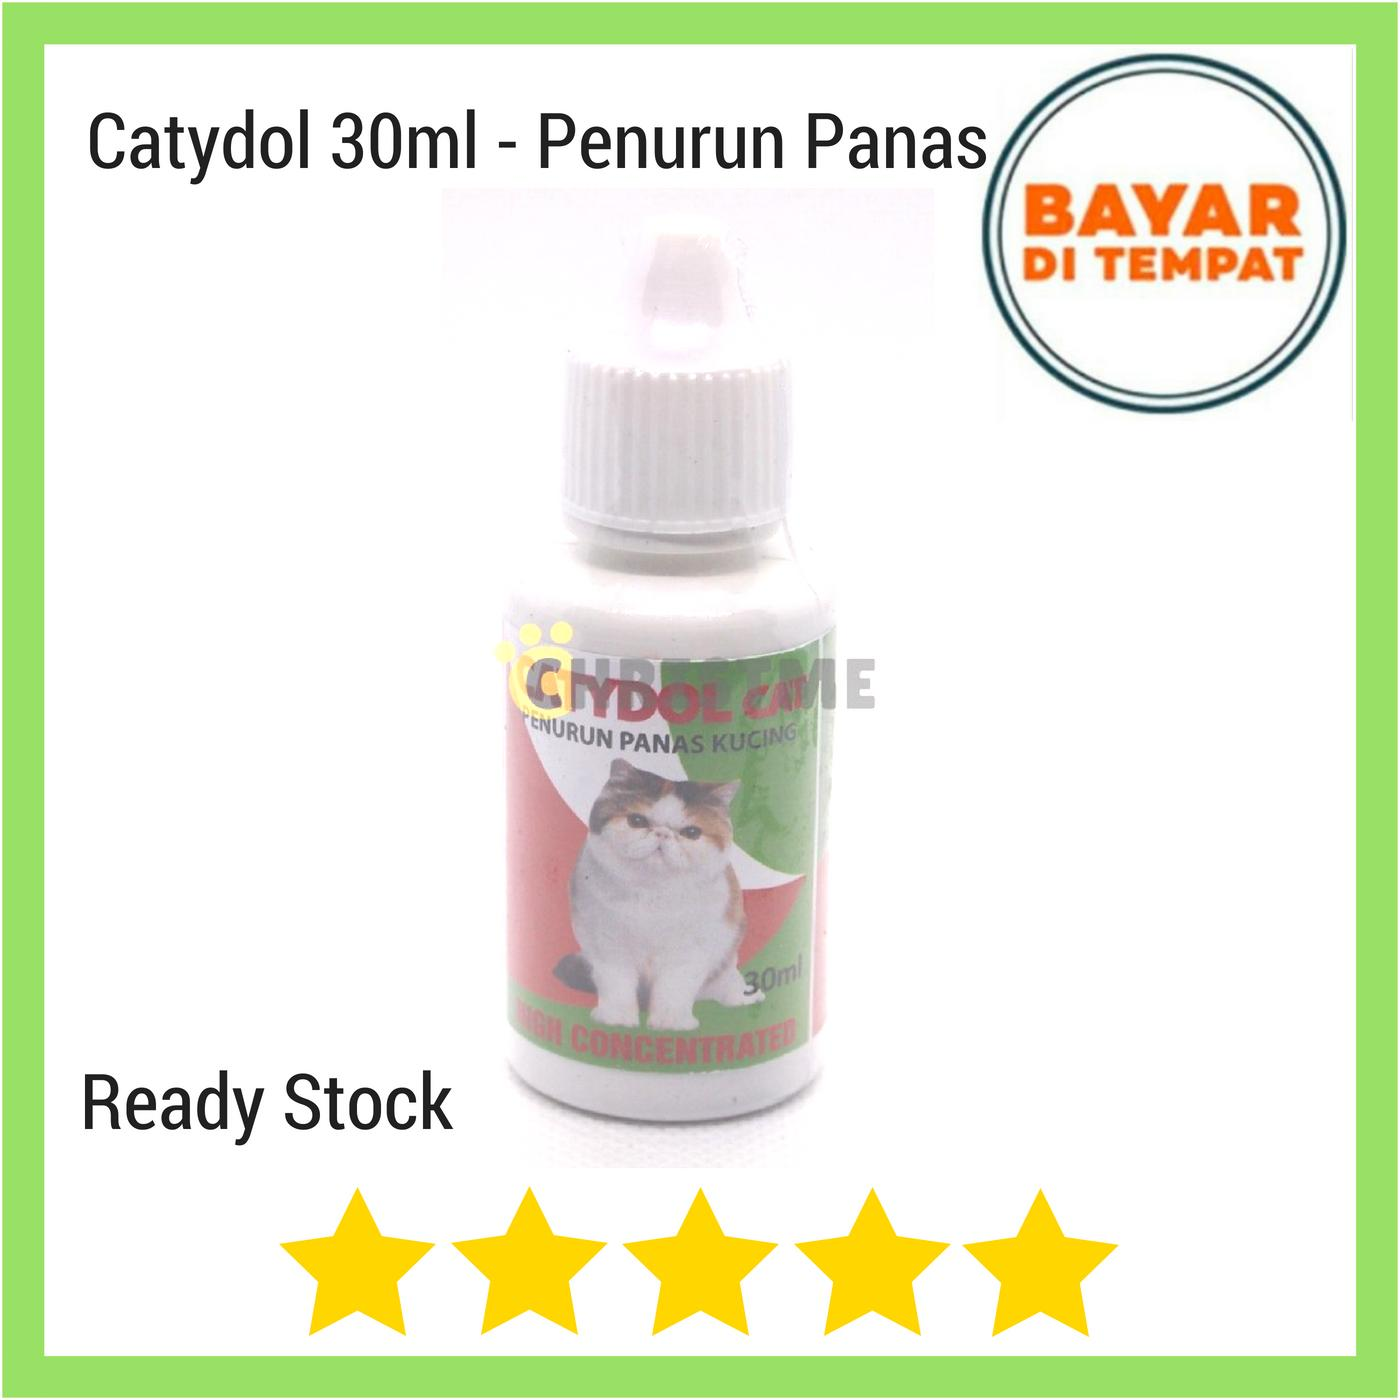 Catydol 30 Ml Original - Obat Penurun Panas Kucing High Concentrate By Christ Me.